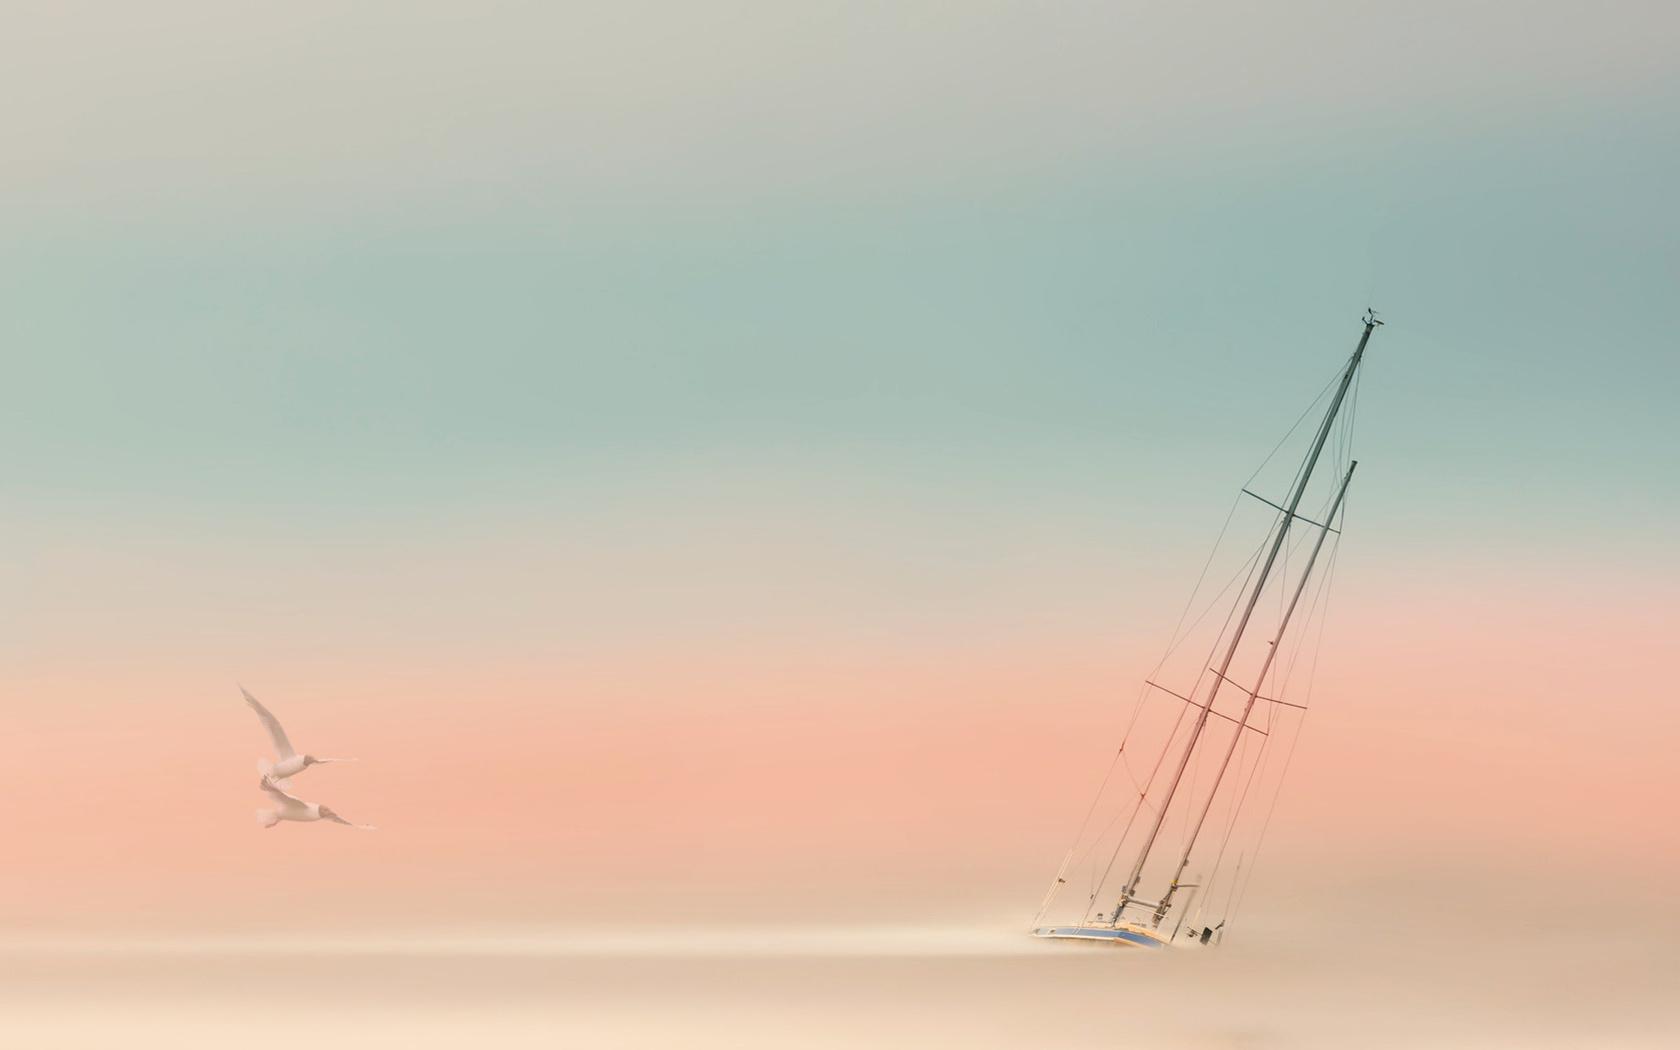 туман, яхта, чайки